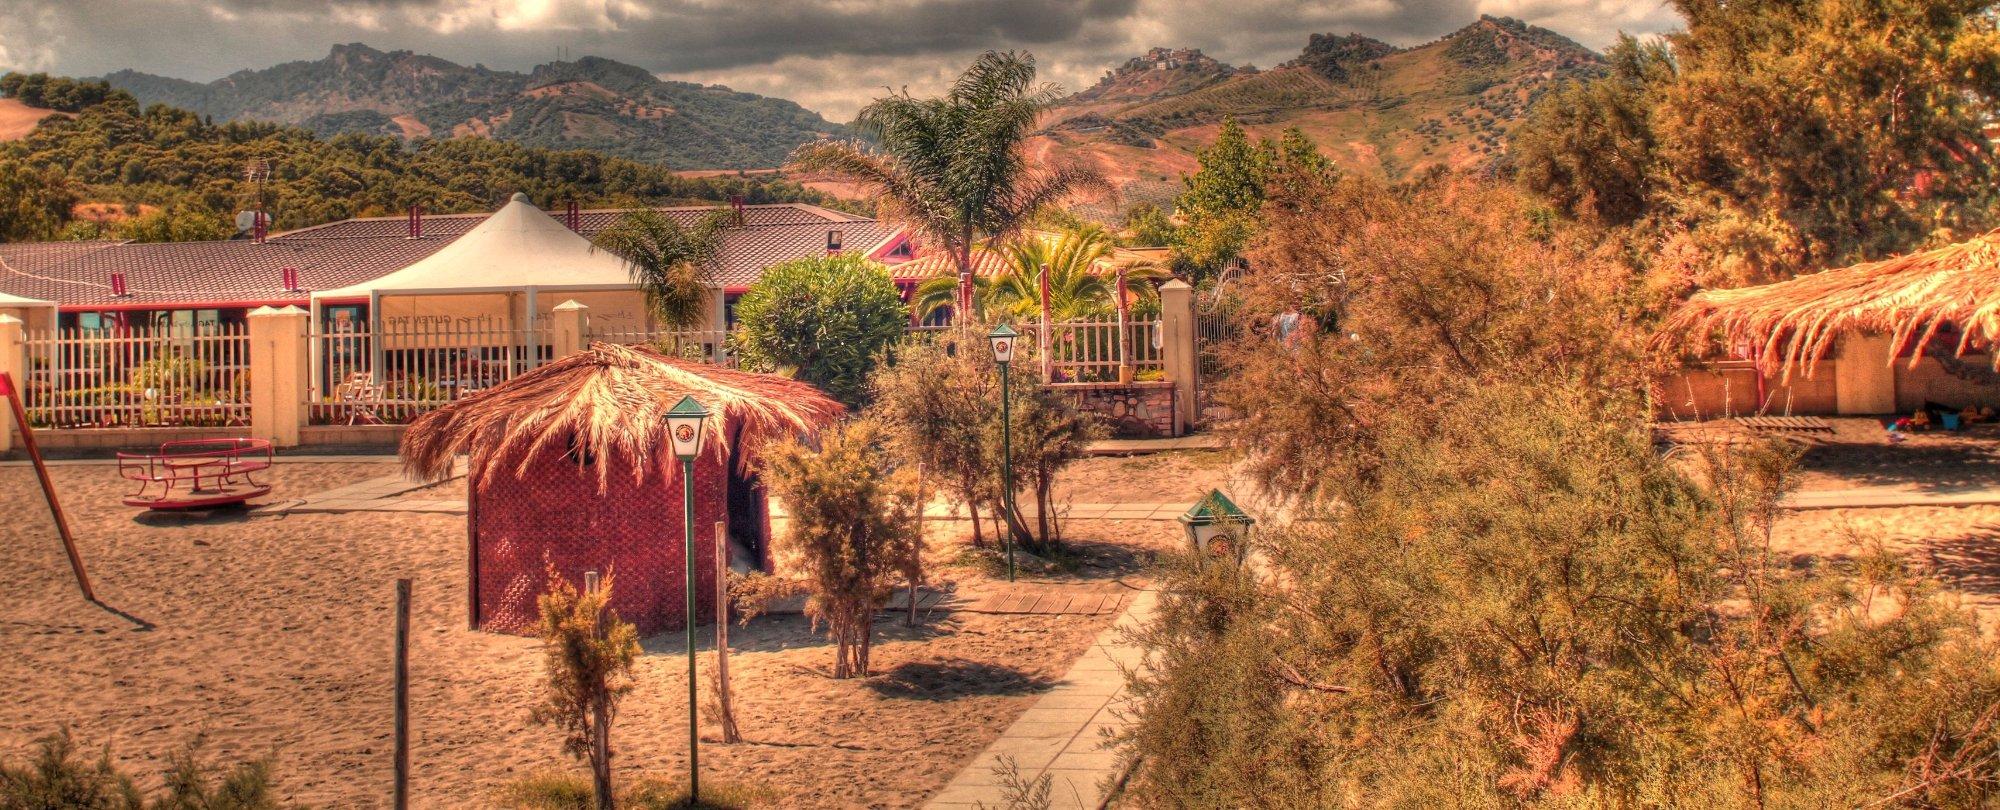 Villaggio Camping da Mario